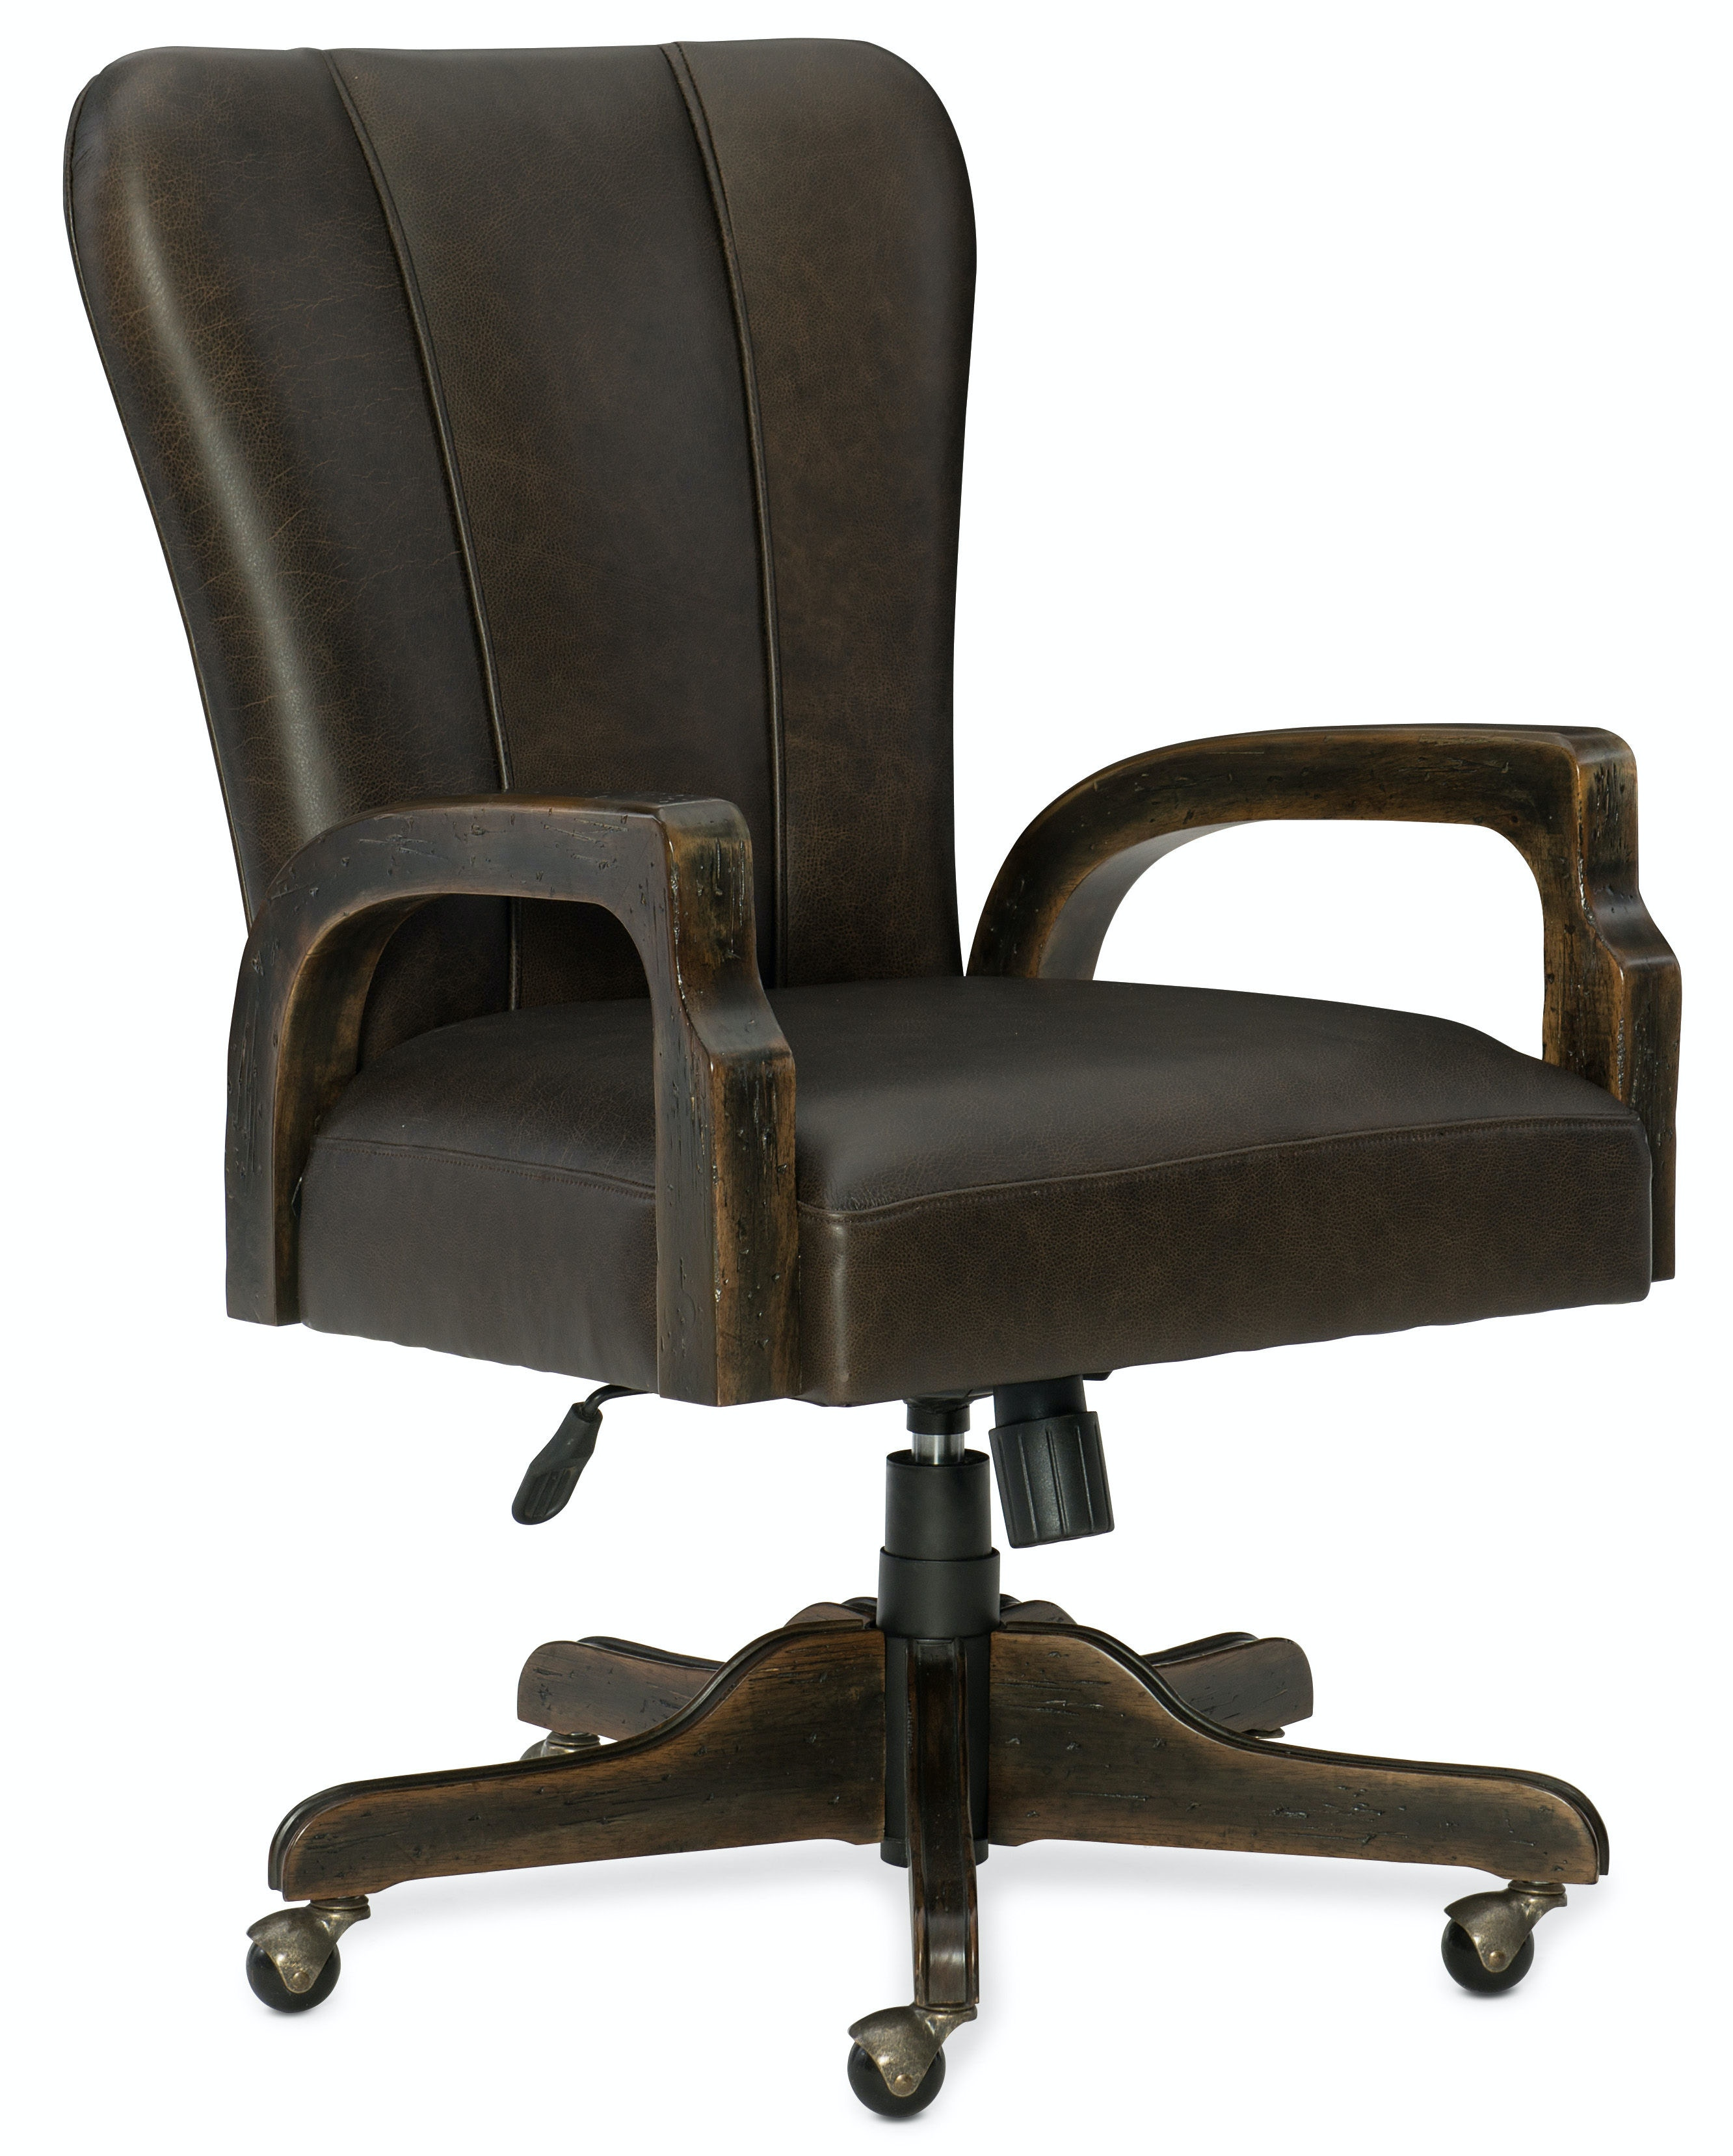 Hooker Furniture Crafted Desk Chair 1654 30220 DKW1